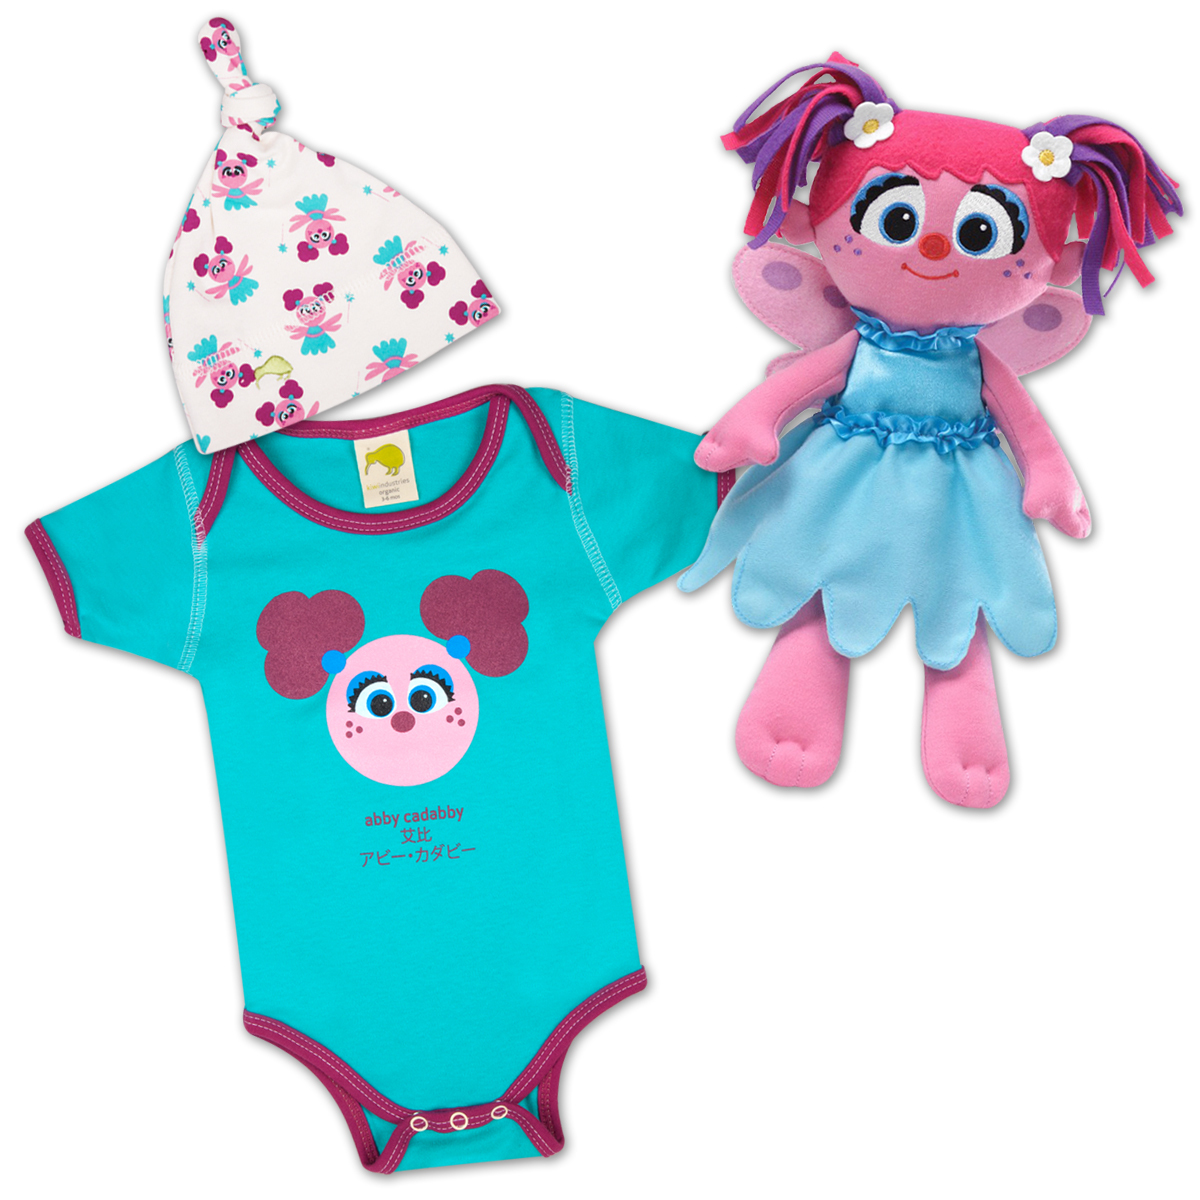 Abby Cadabby Baby Bundle